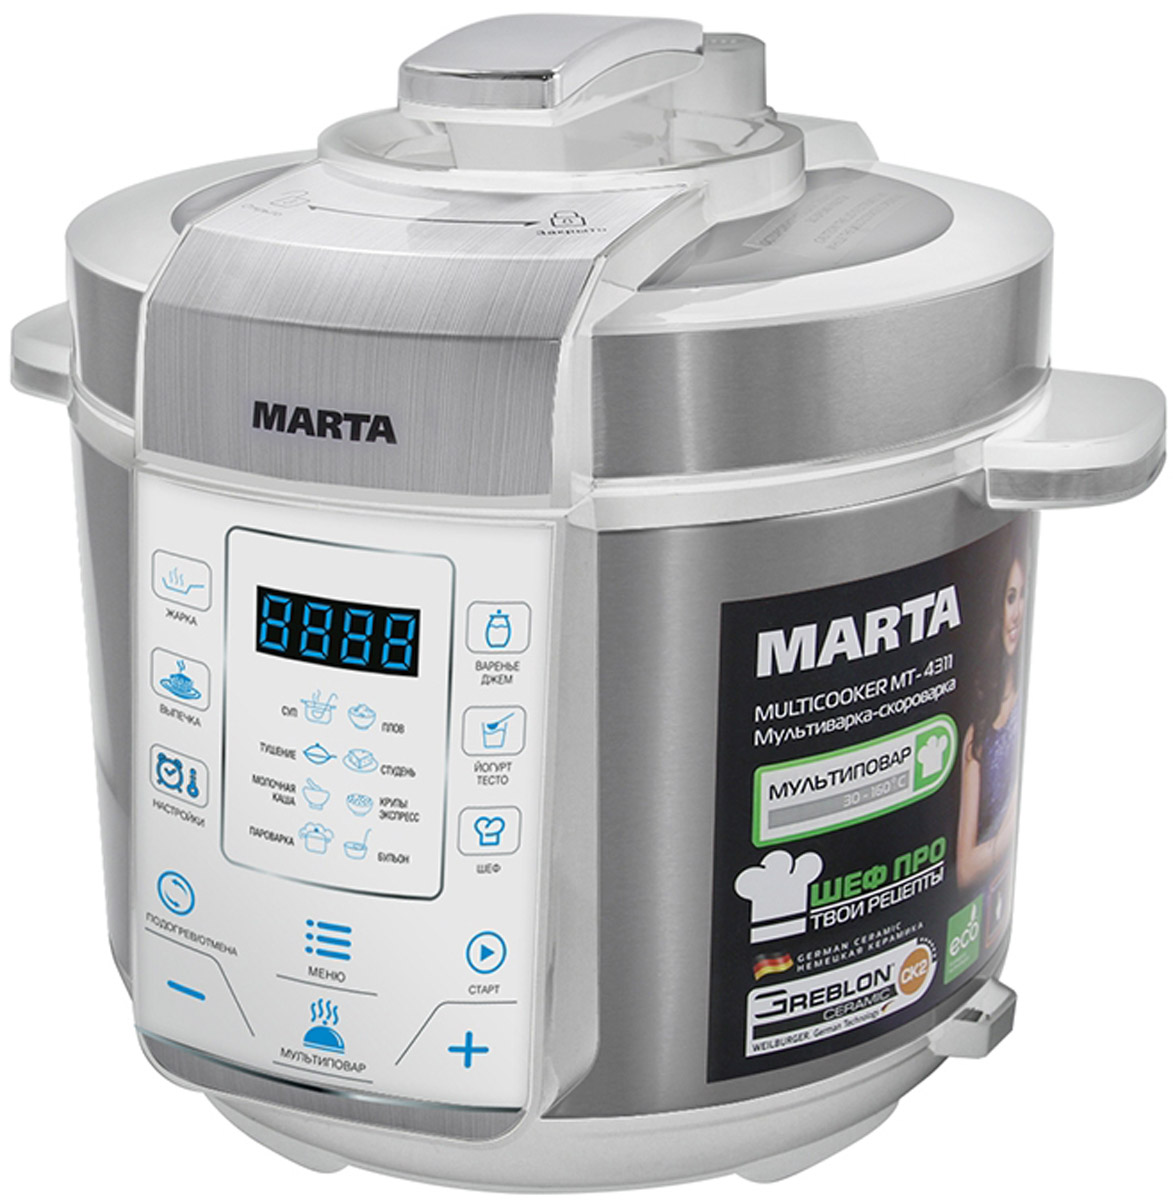 Marta MT-4311, White Steel мультиварка